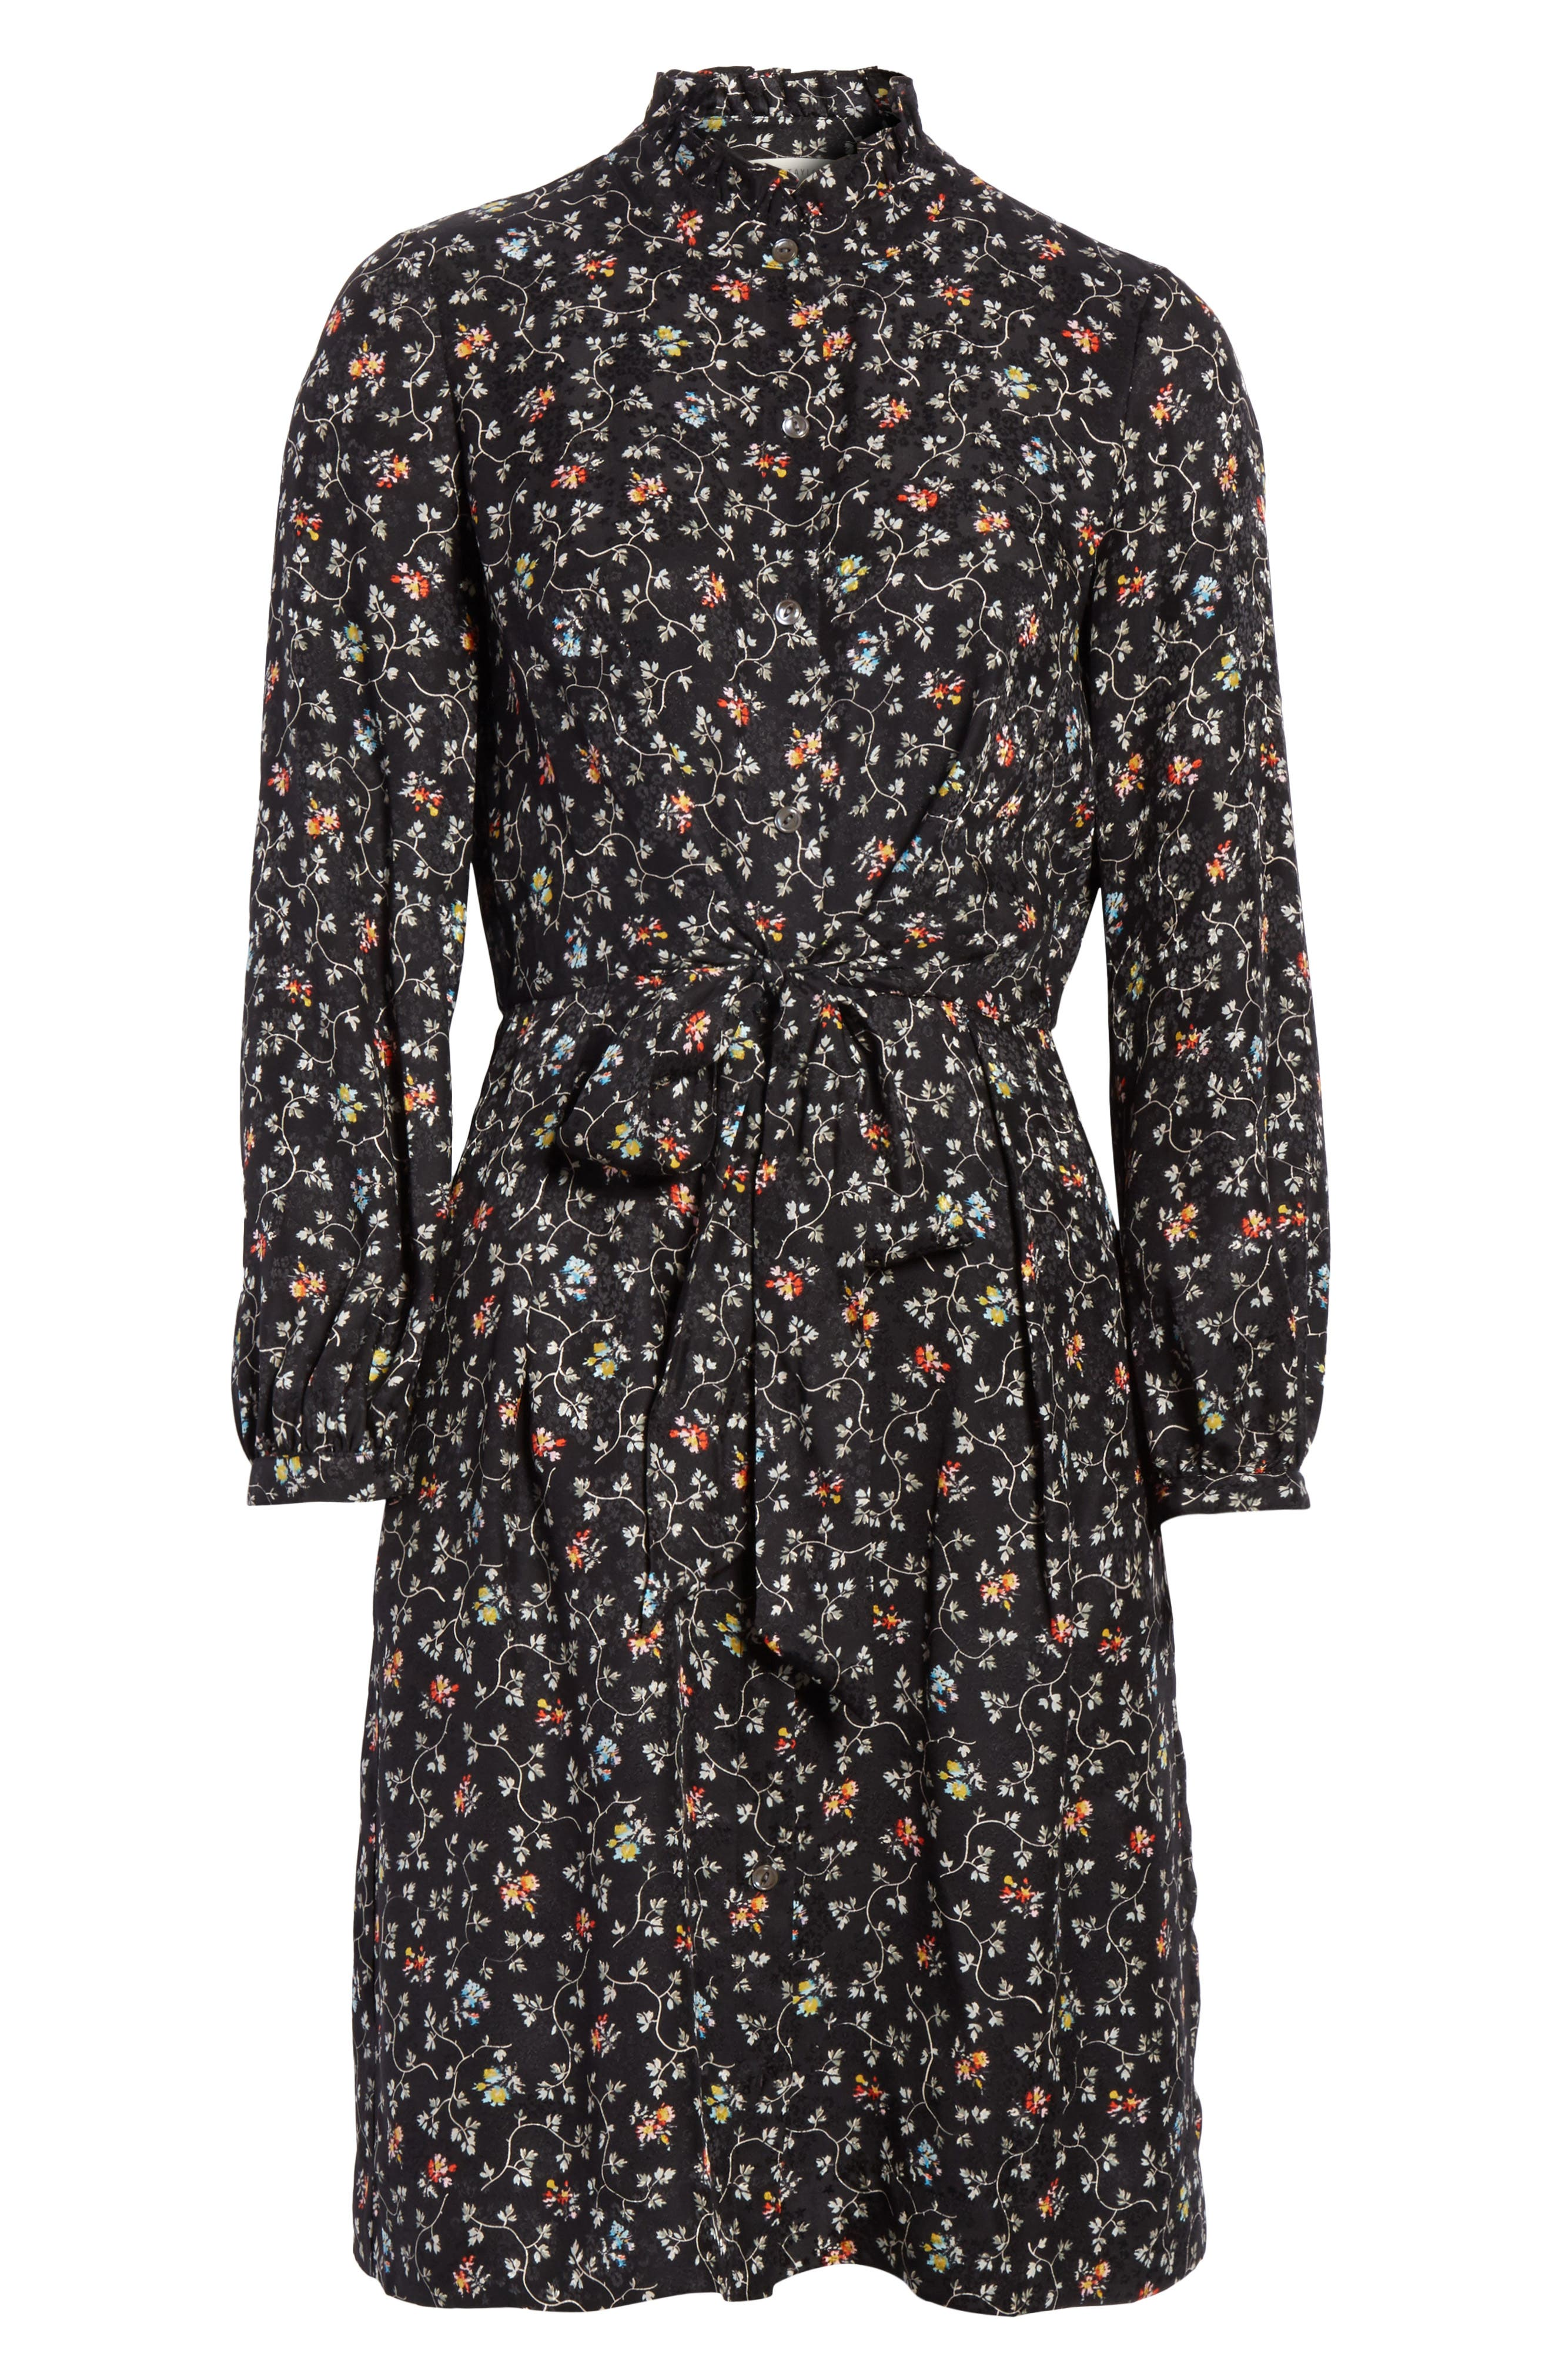 Floral Vine Silk Shirtdress,                             Alternate thumbnail 6, color,                             Black Vine Print